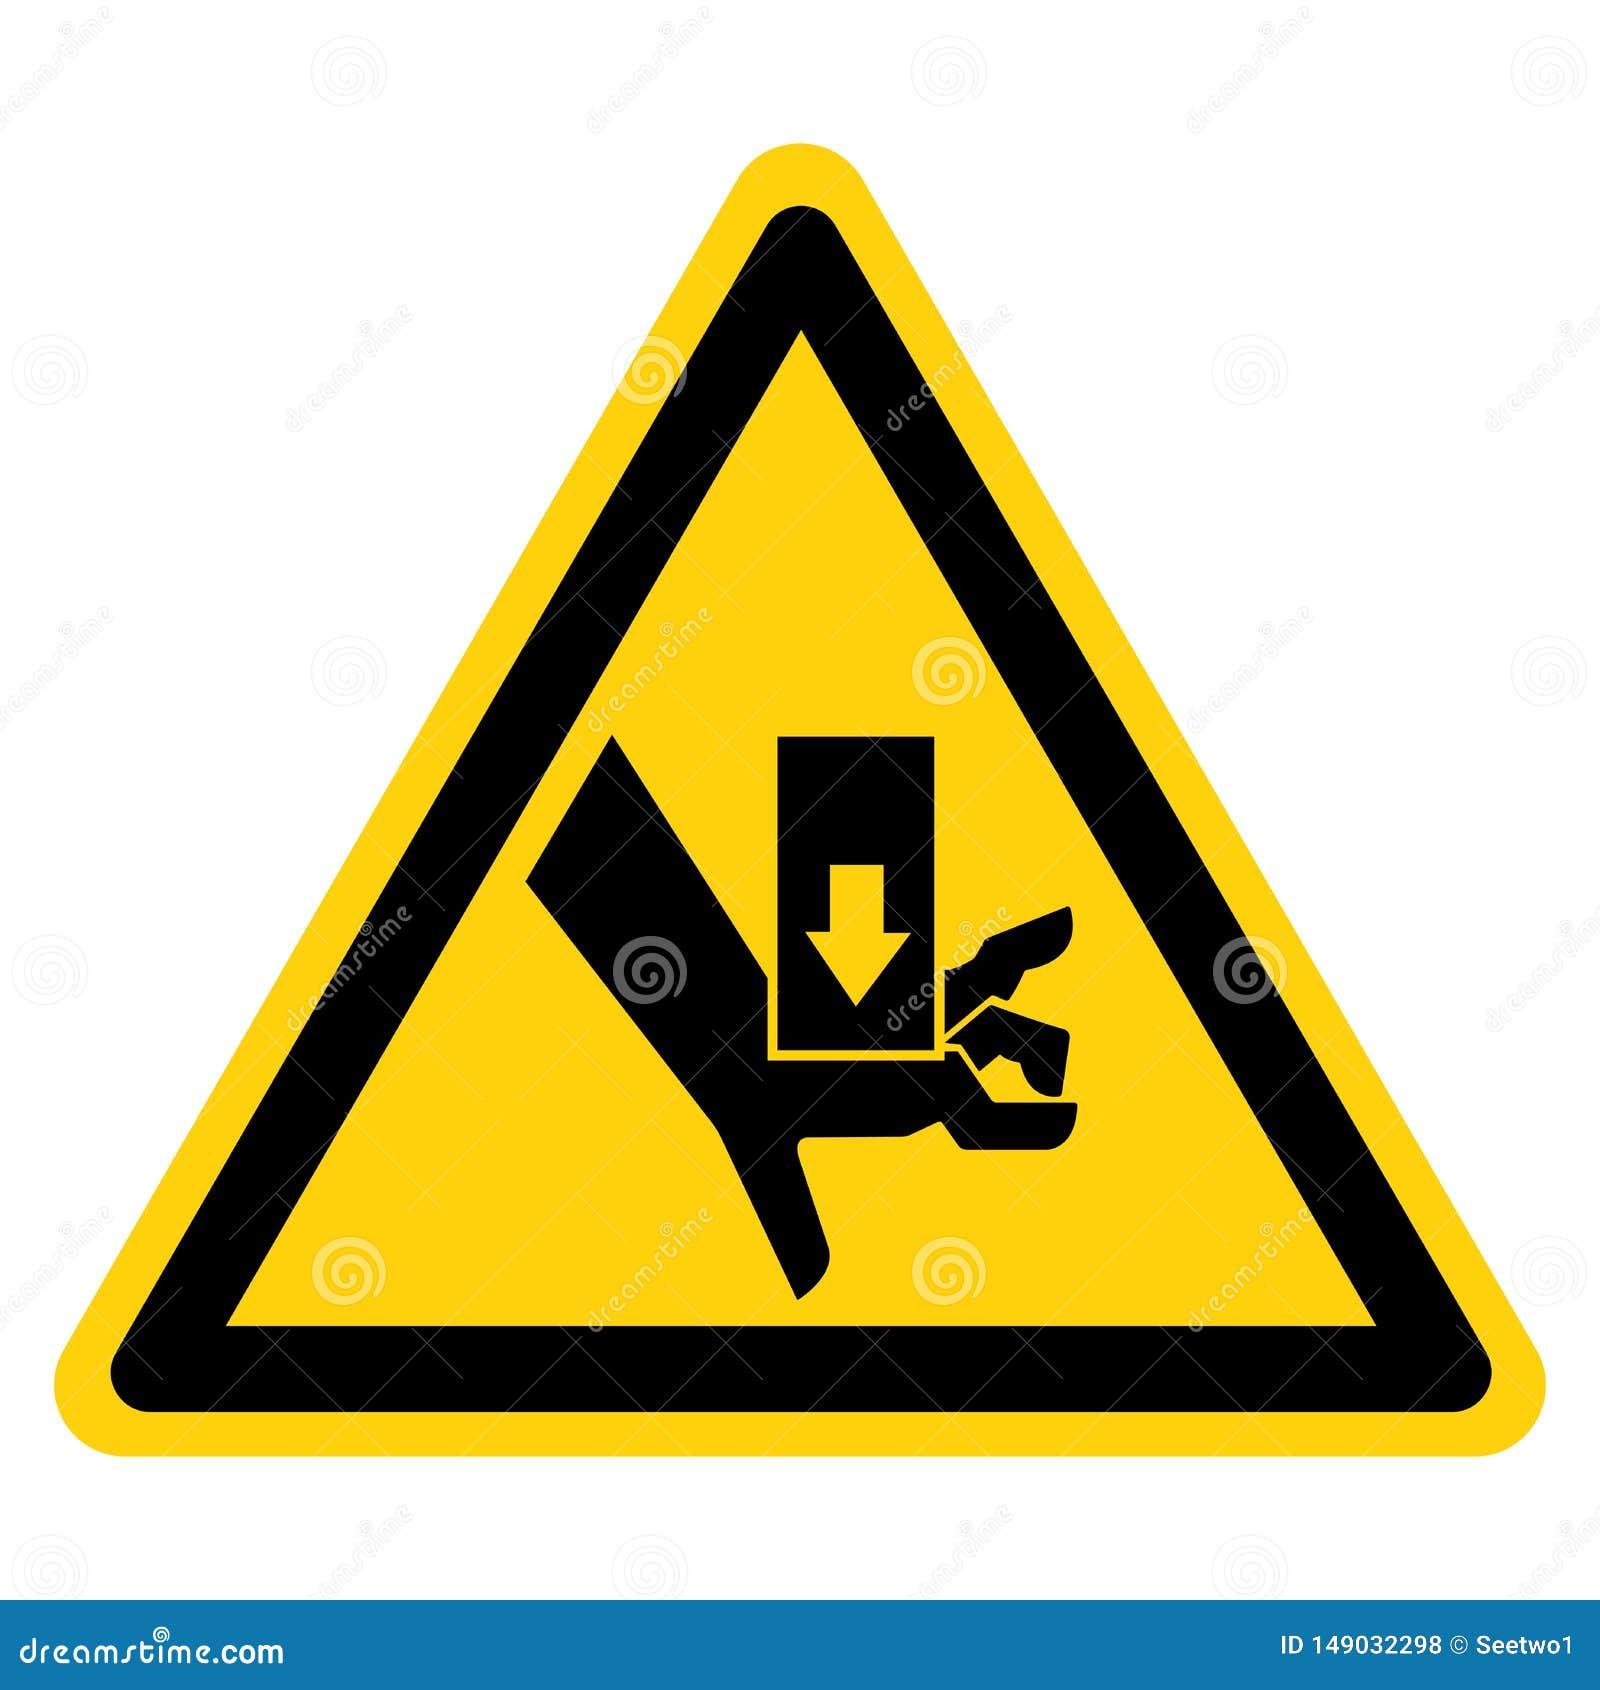 A m?o esmaga a for?a de cima do isolado do sinal do s?mbolo no fundo branco, ilustra??o do vetor